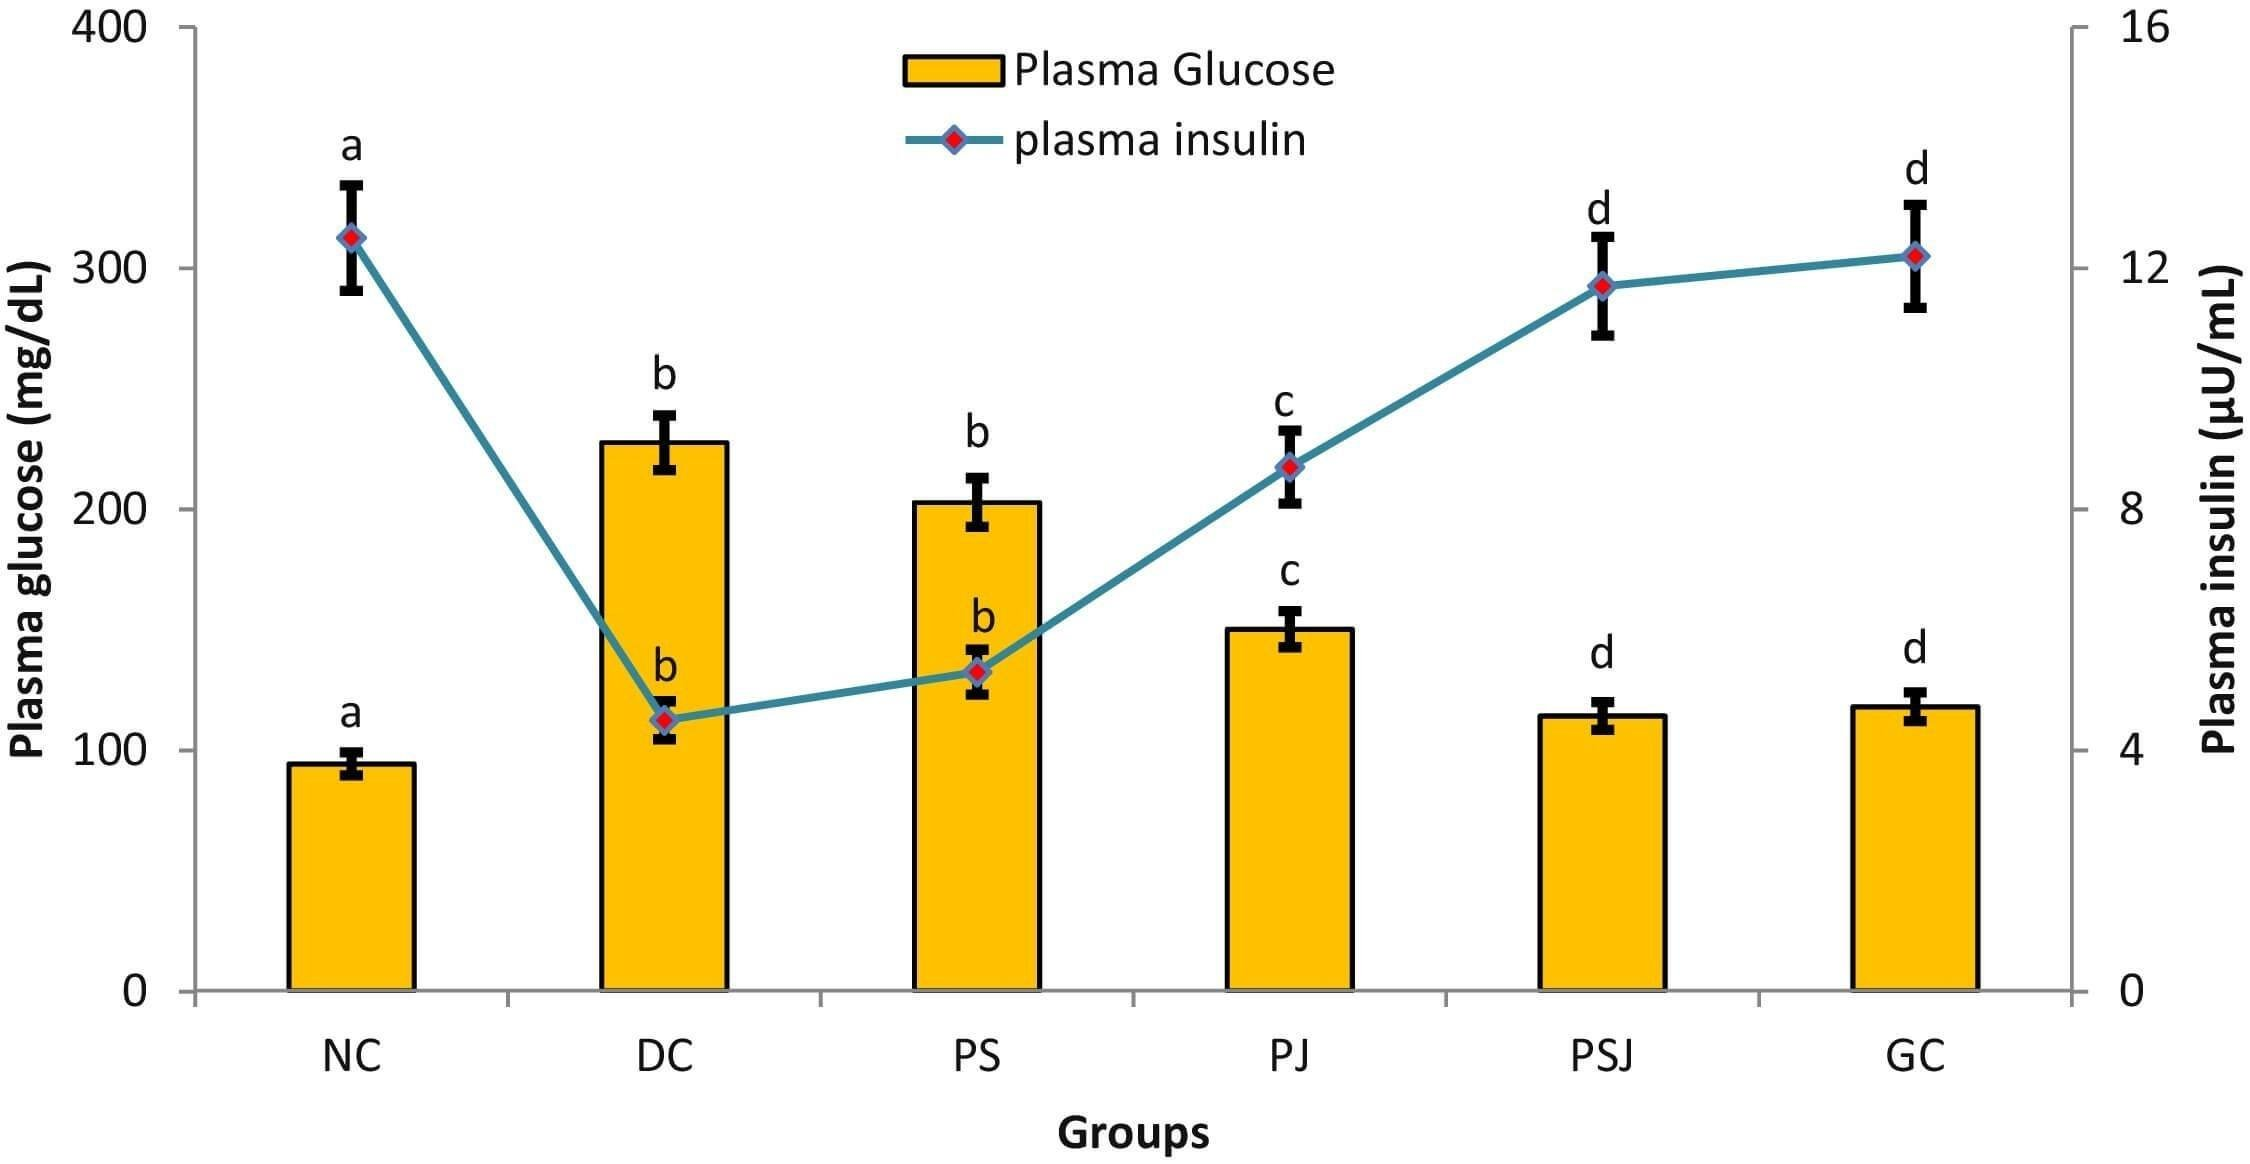 Streptozotocin-nicotinamide-induced Diabetic Model